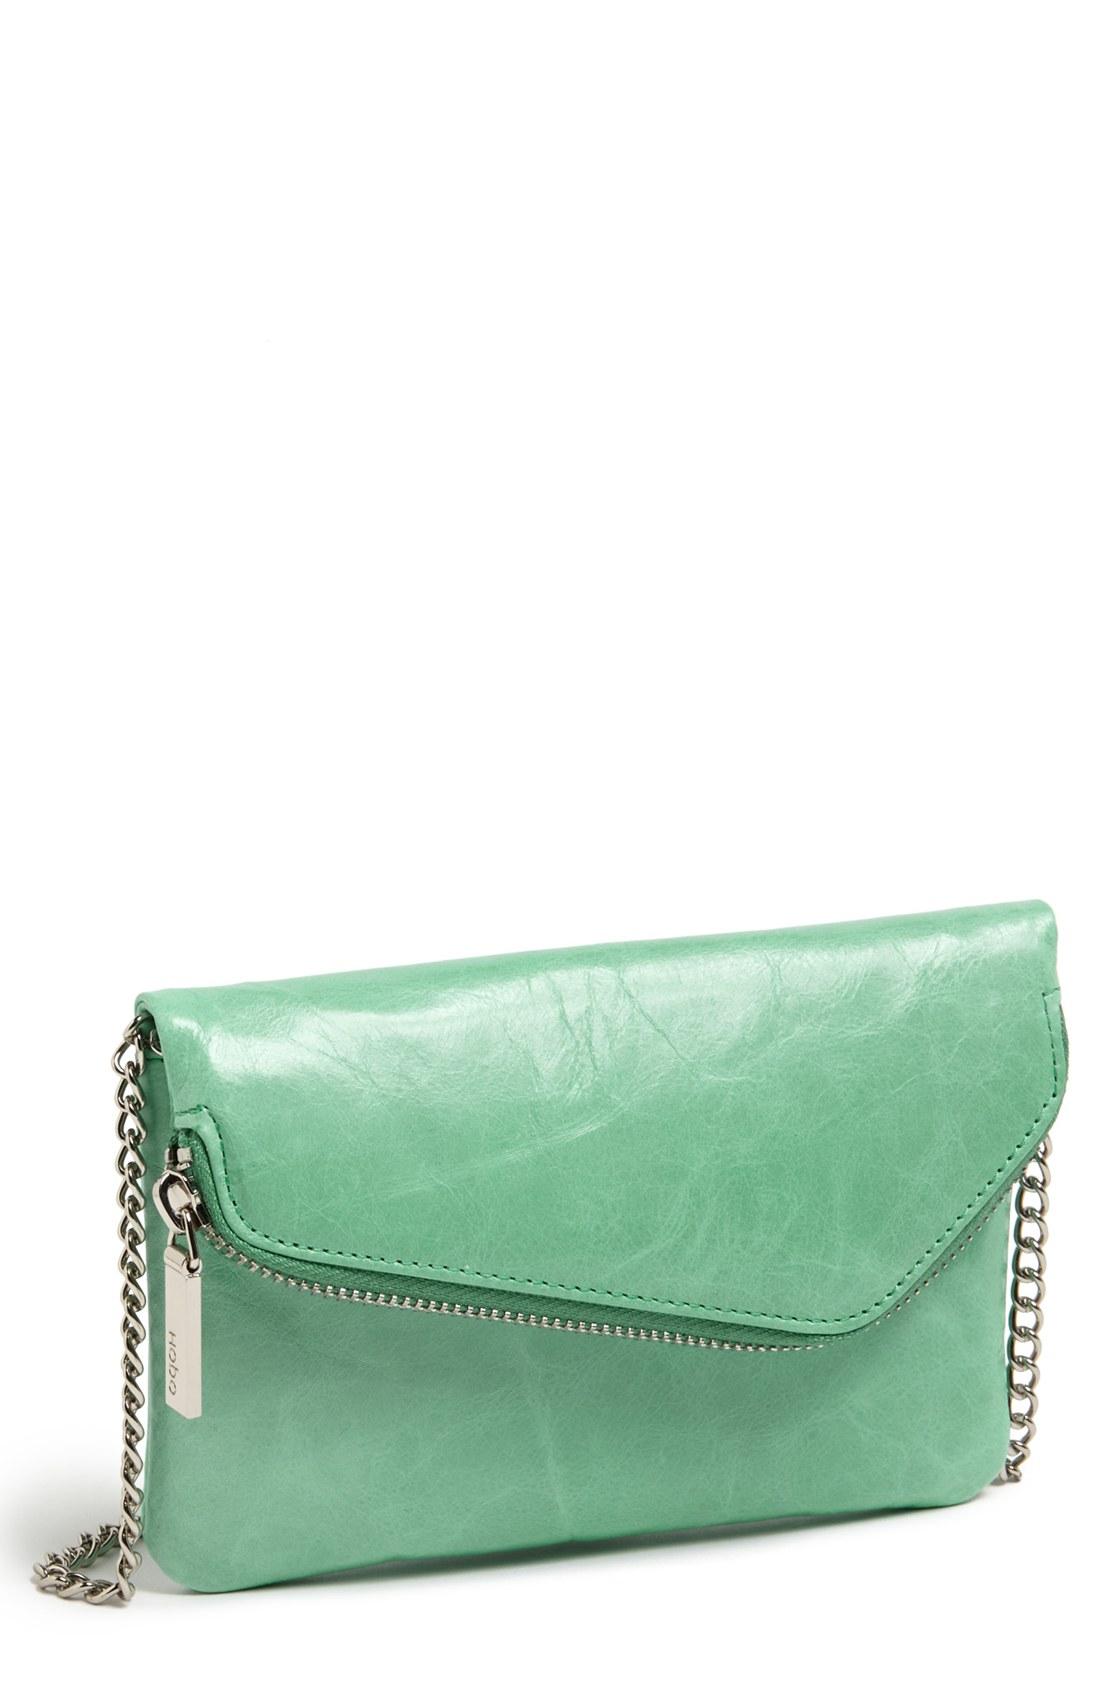 hobo zara vintage crossbody bag in green mint lyst